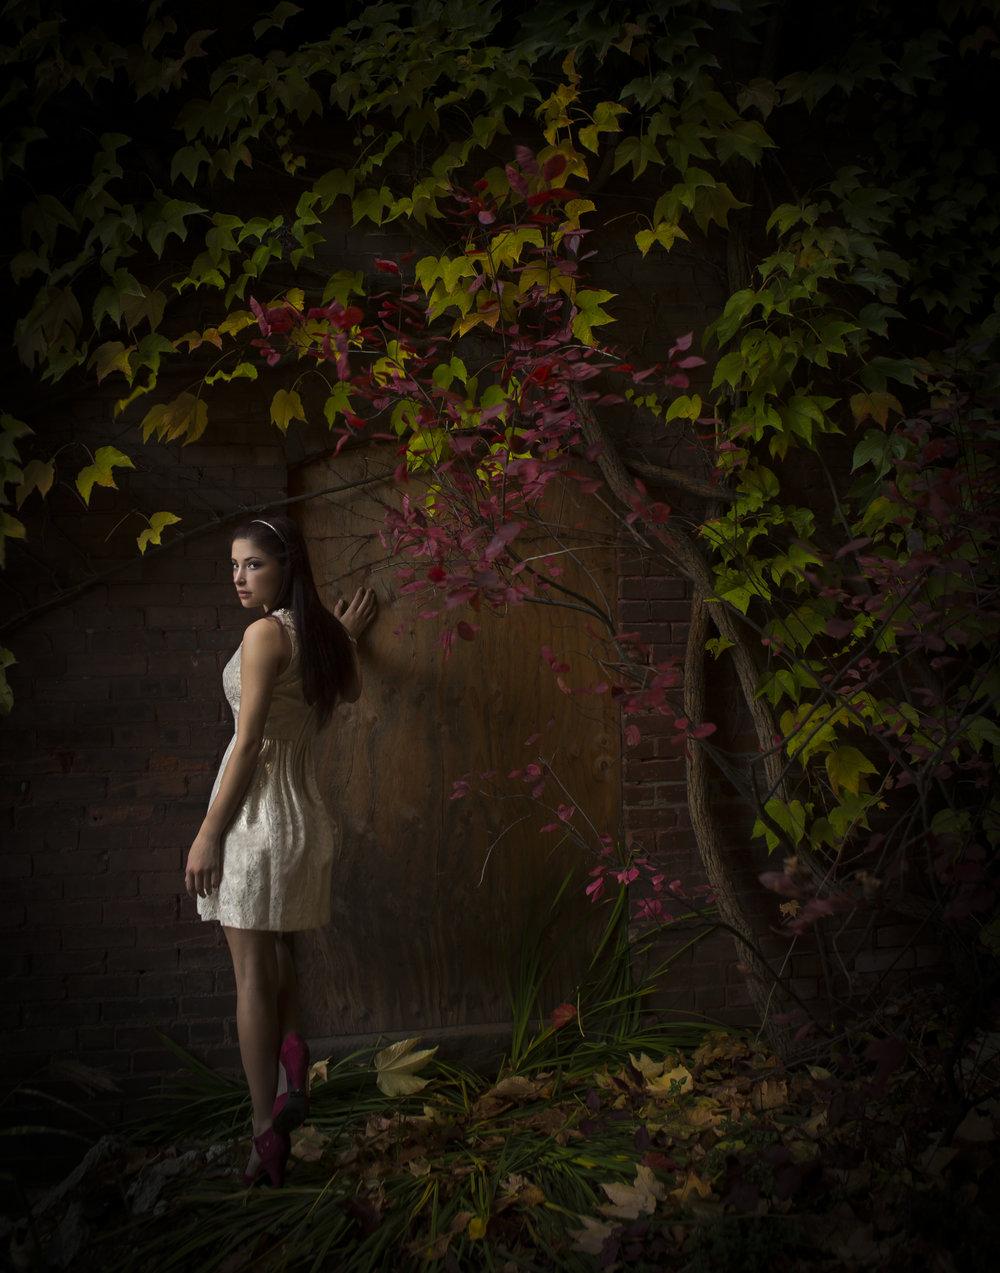 02-Reilly-Jessica-P4M1.jpg